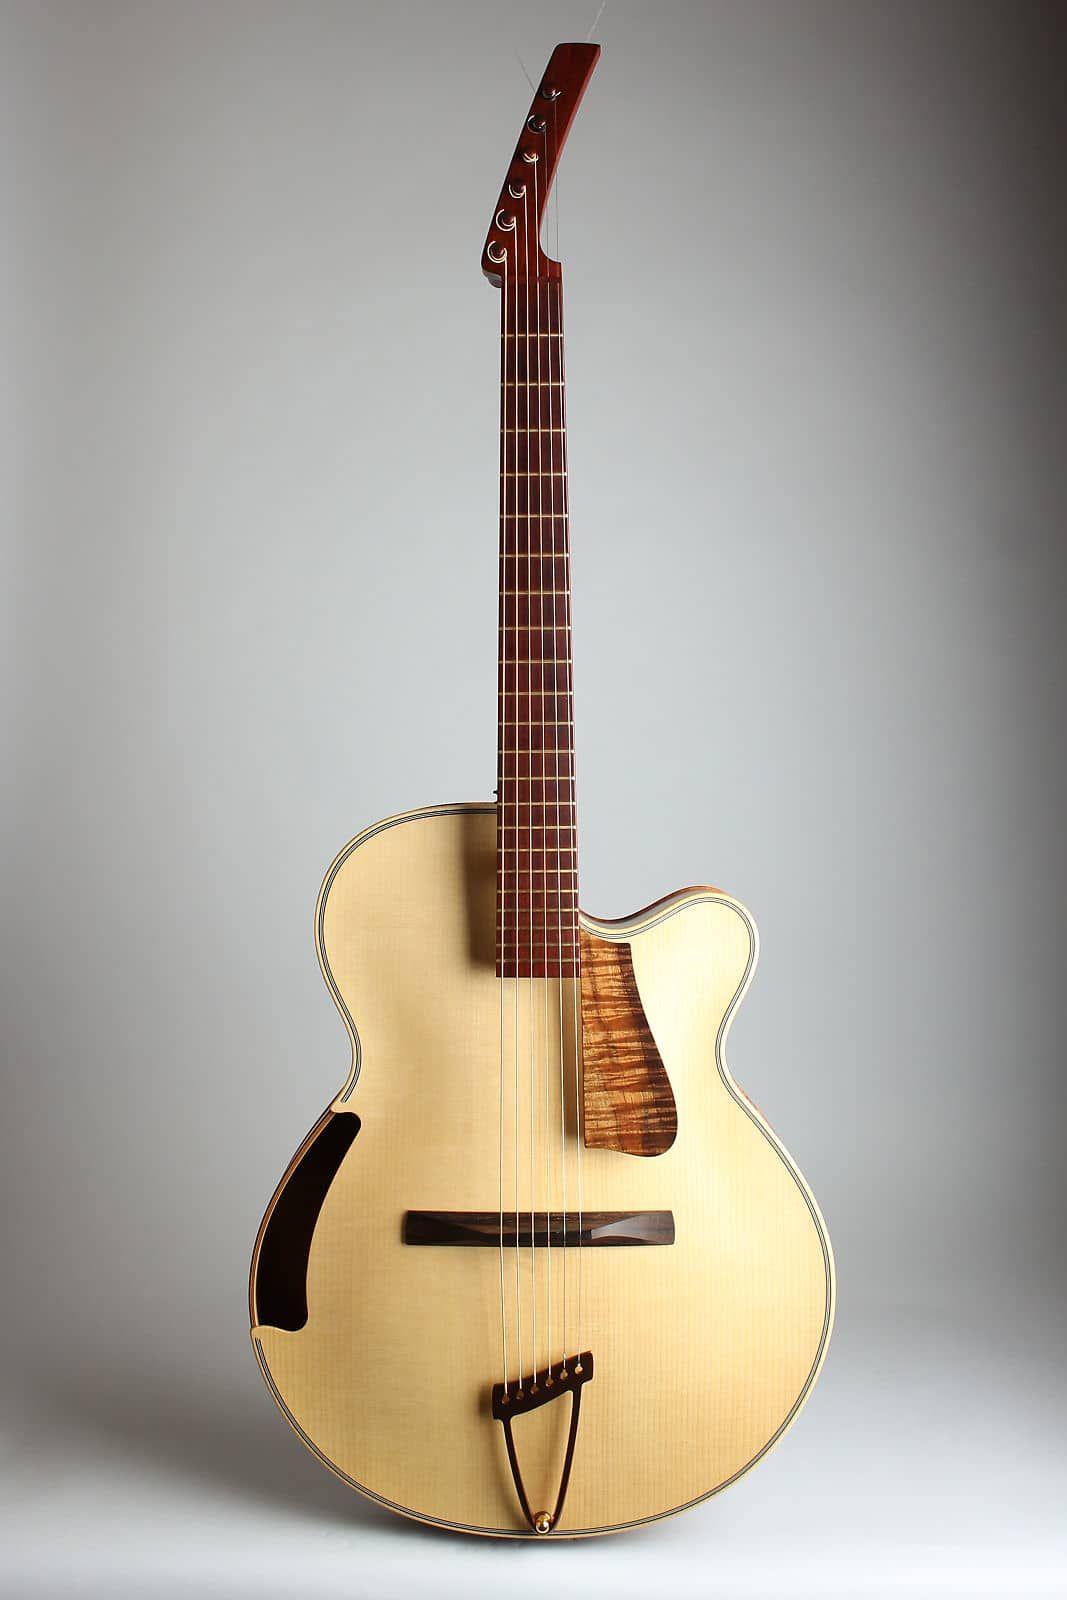 Ken Parker Olive Branch Arch Top Acoustic Guitar 2006 Original Black Hoffee Road Case Retrofret Vintage Guitars Reverb Acoustic Guitar Guitar Archtop Guitar